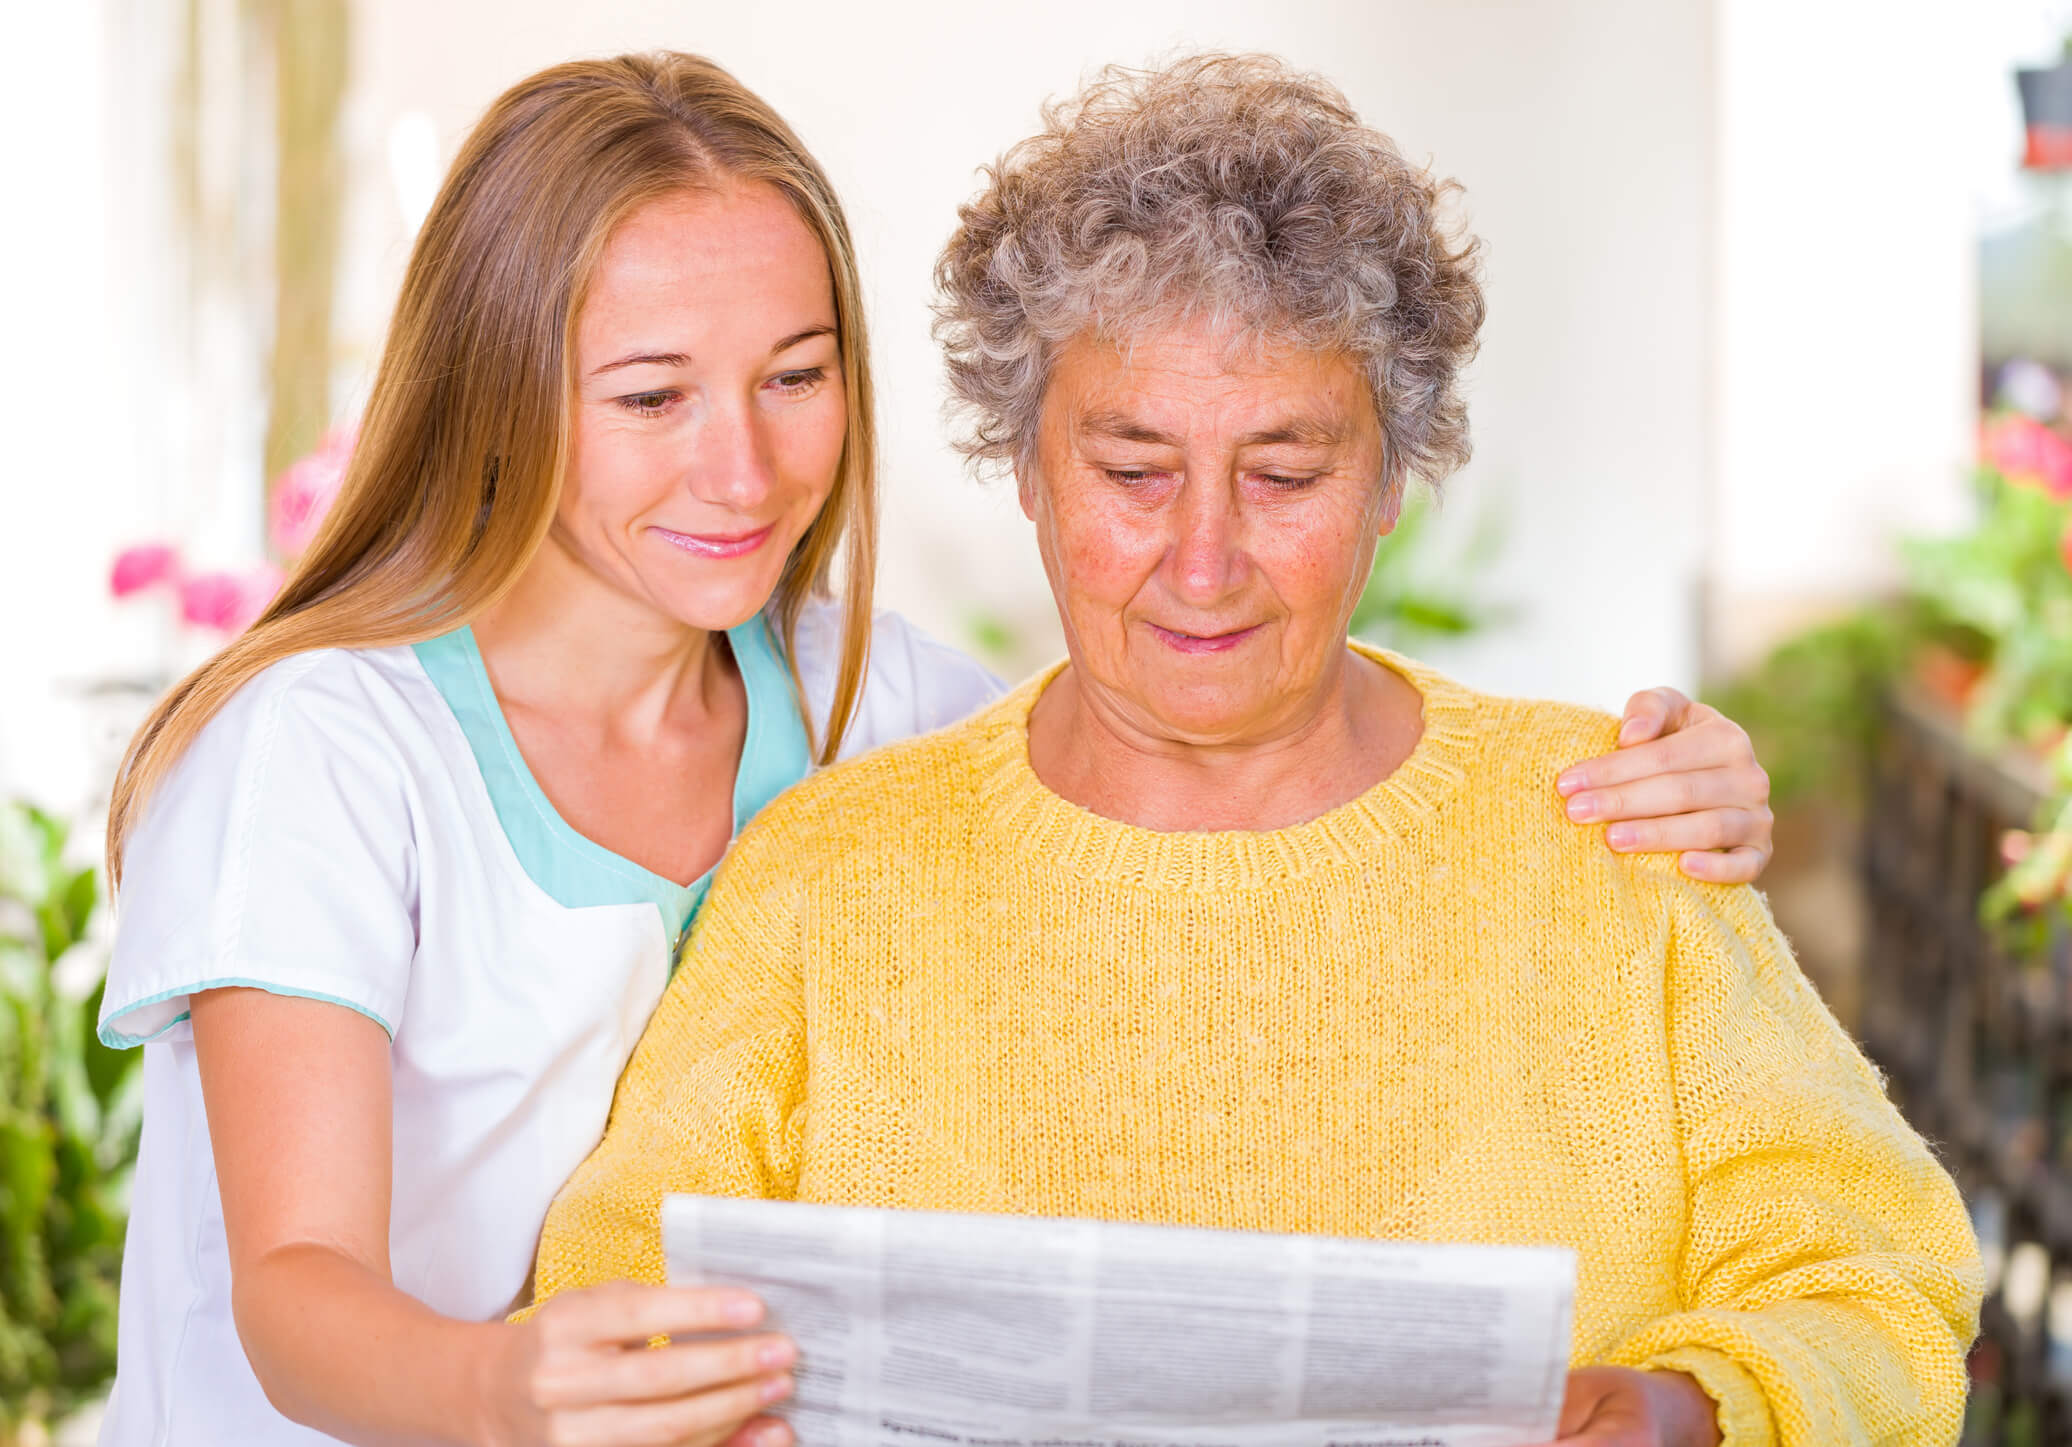 Dementia Care Resources in Canton, GA